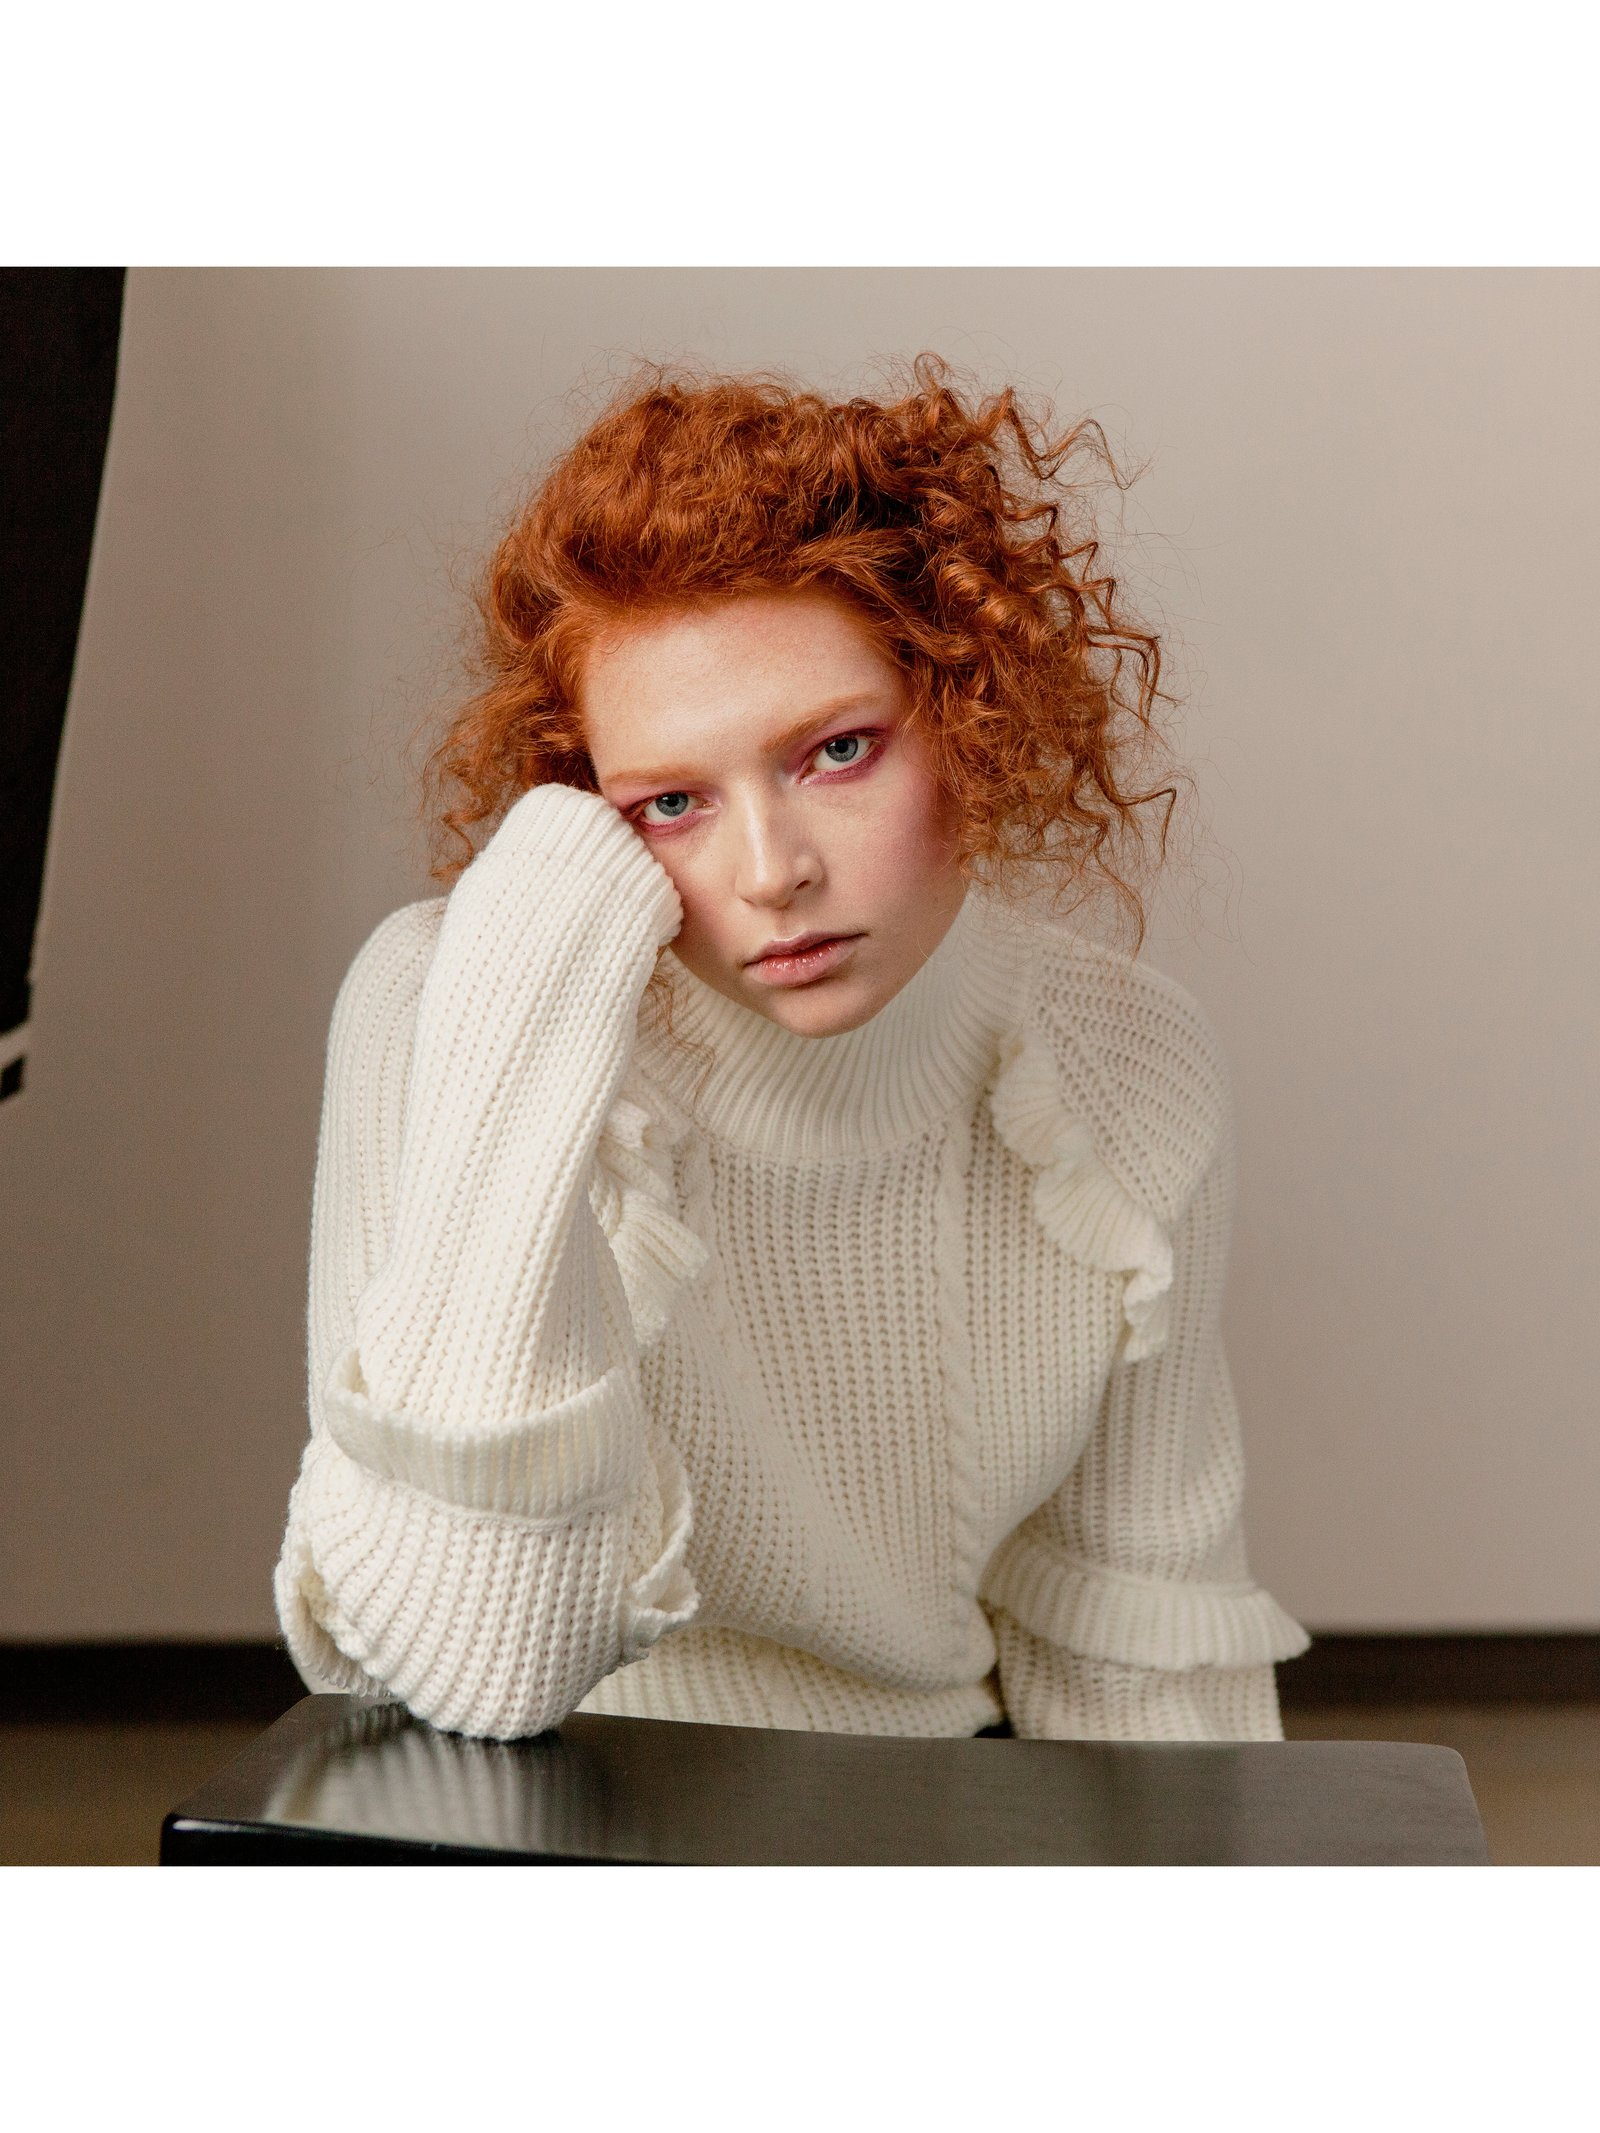 Hilary MacMillan Ruffle Sweater